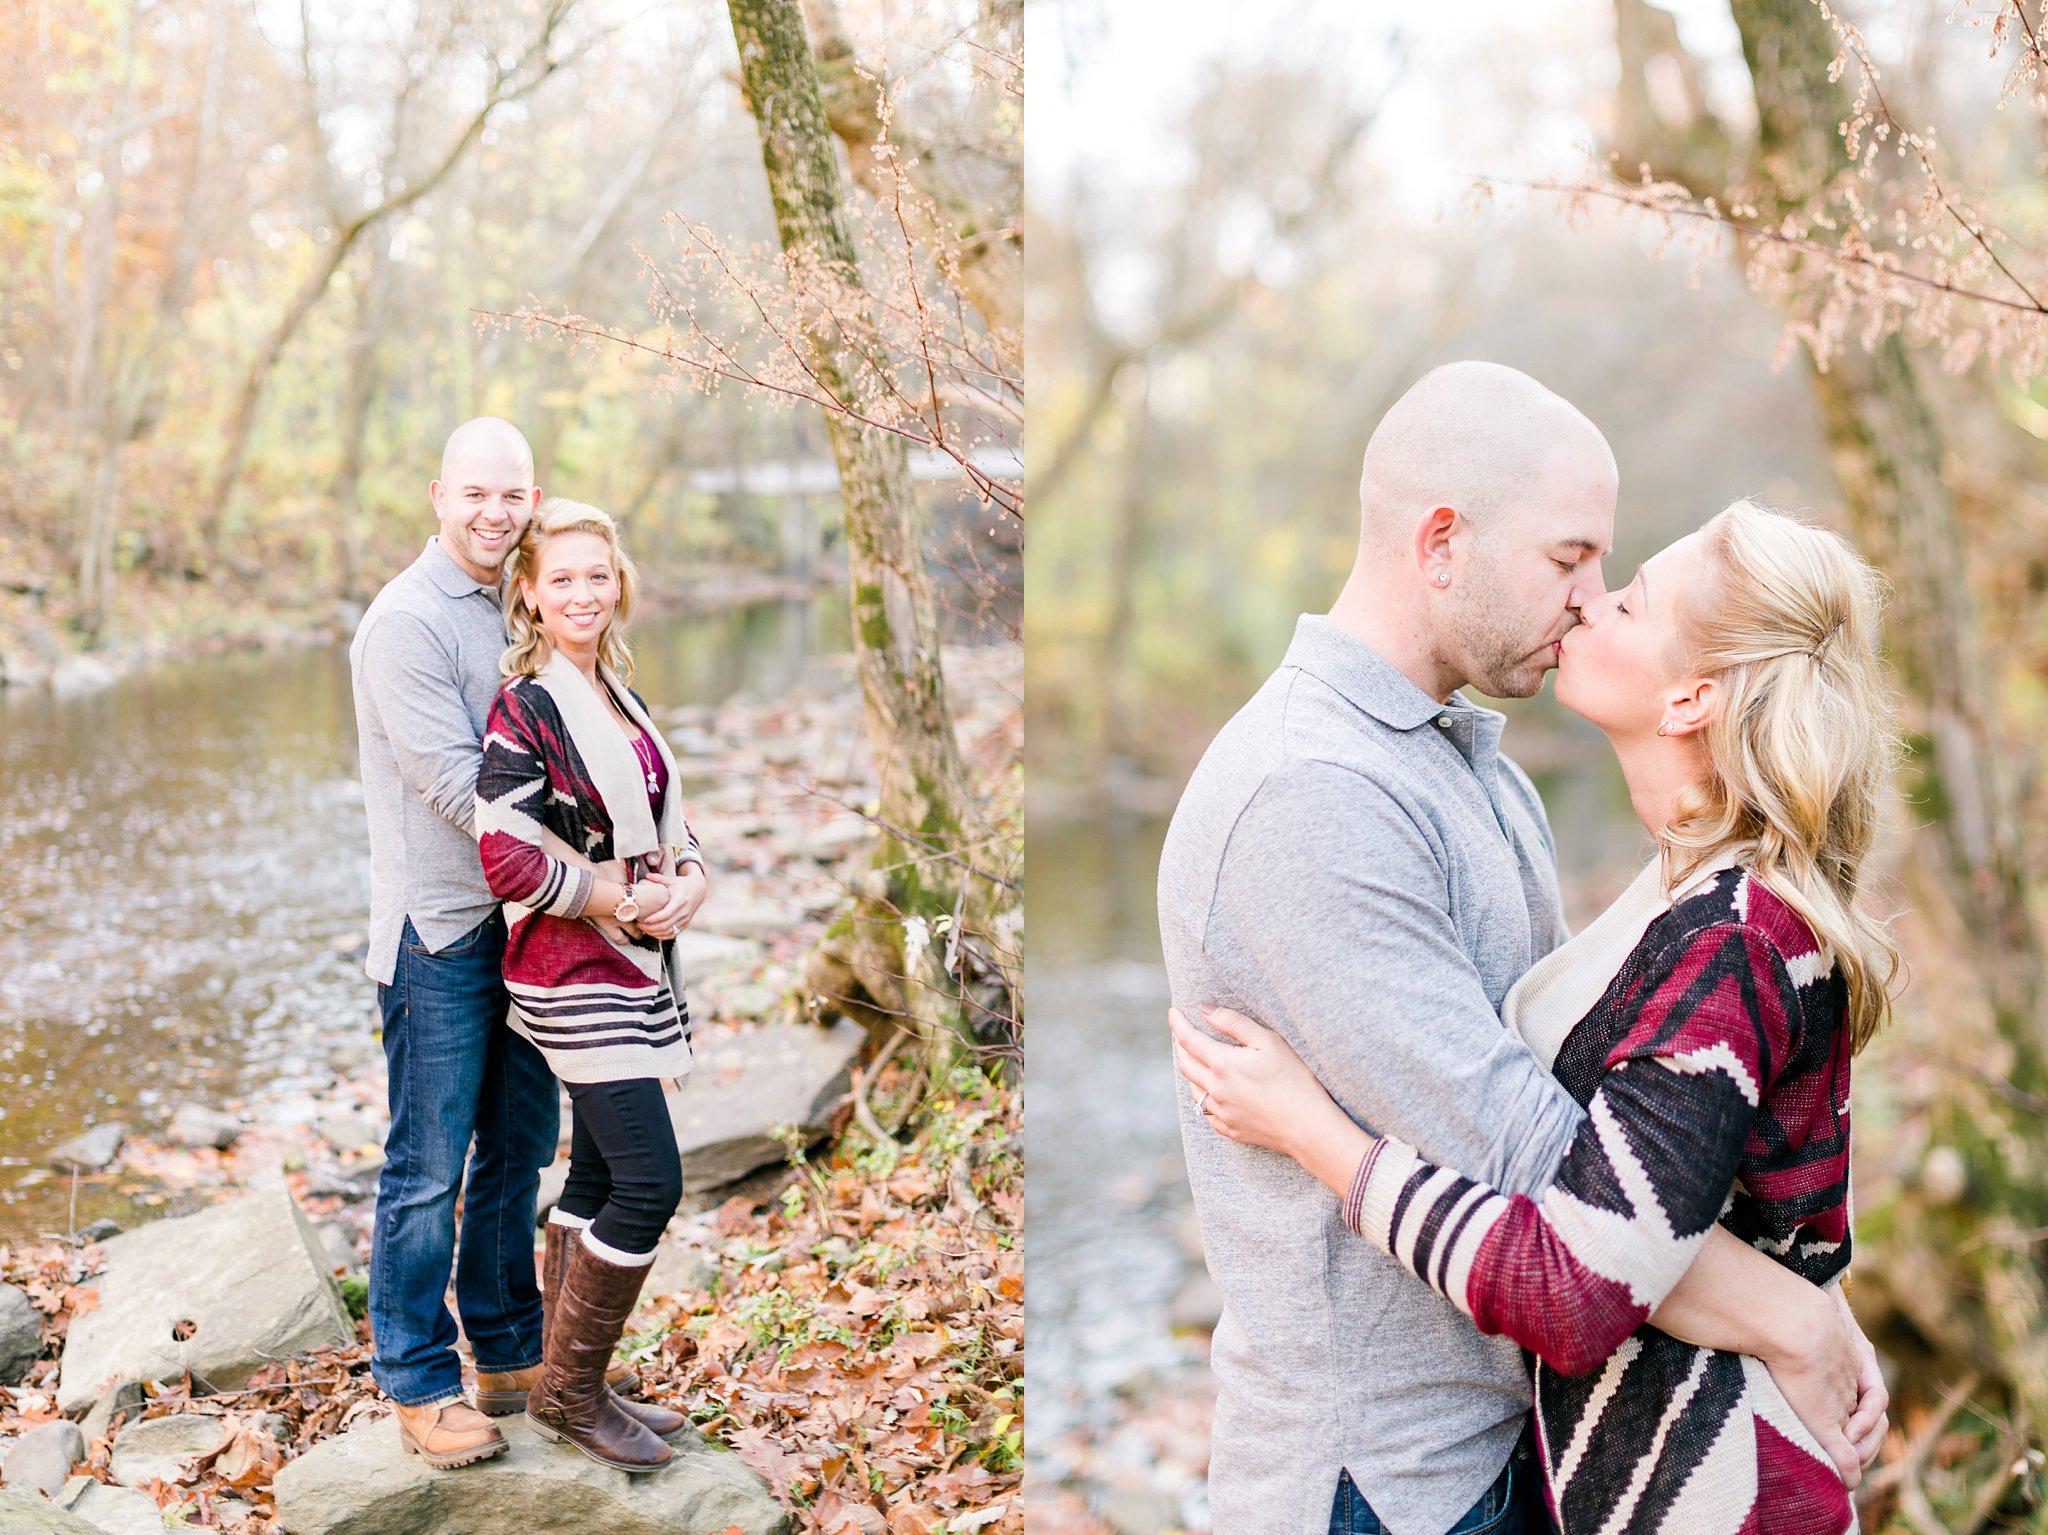 Rock Creek Park Engagement Photos DC Wedding Photographer Megan Kelsey Photography Katie & Conor-64.jpg